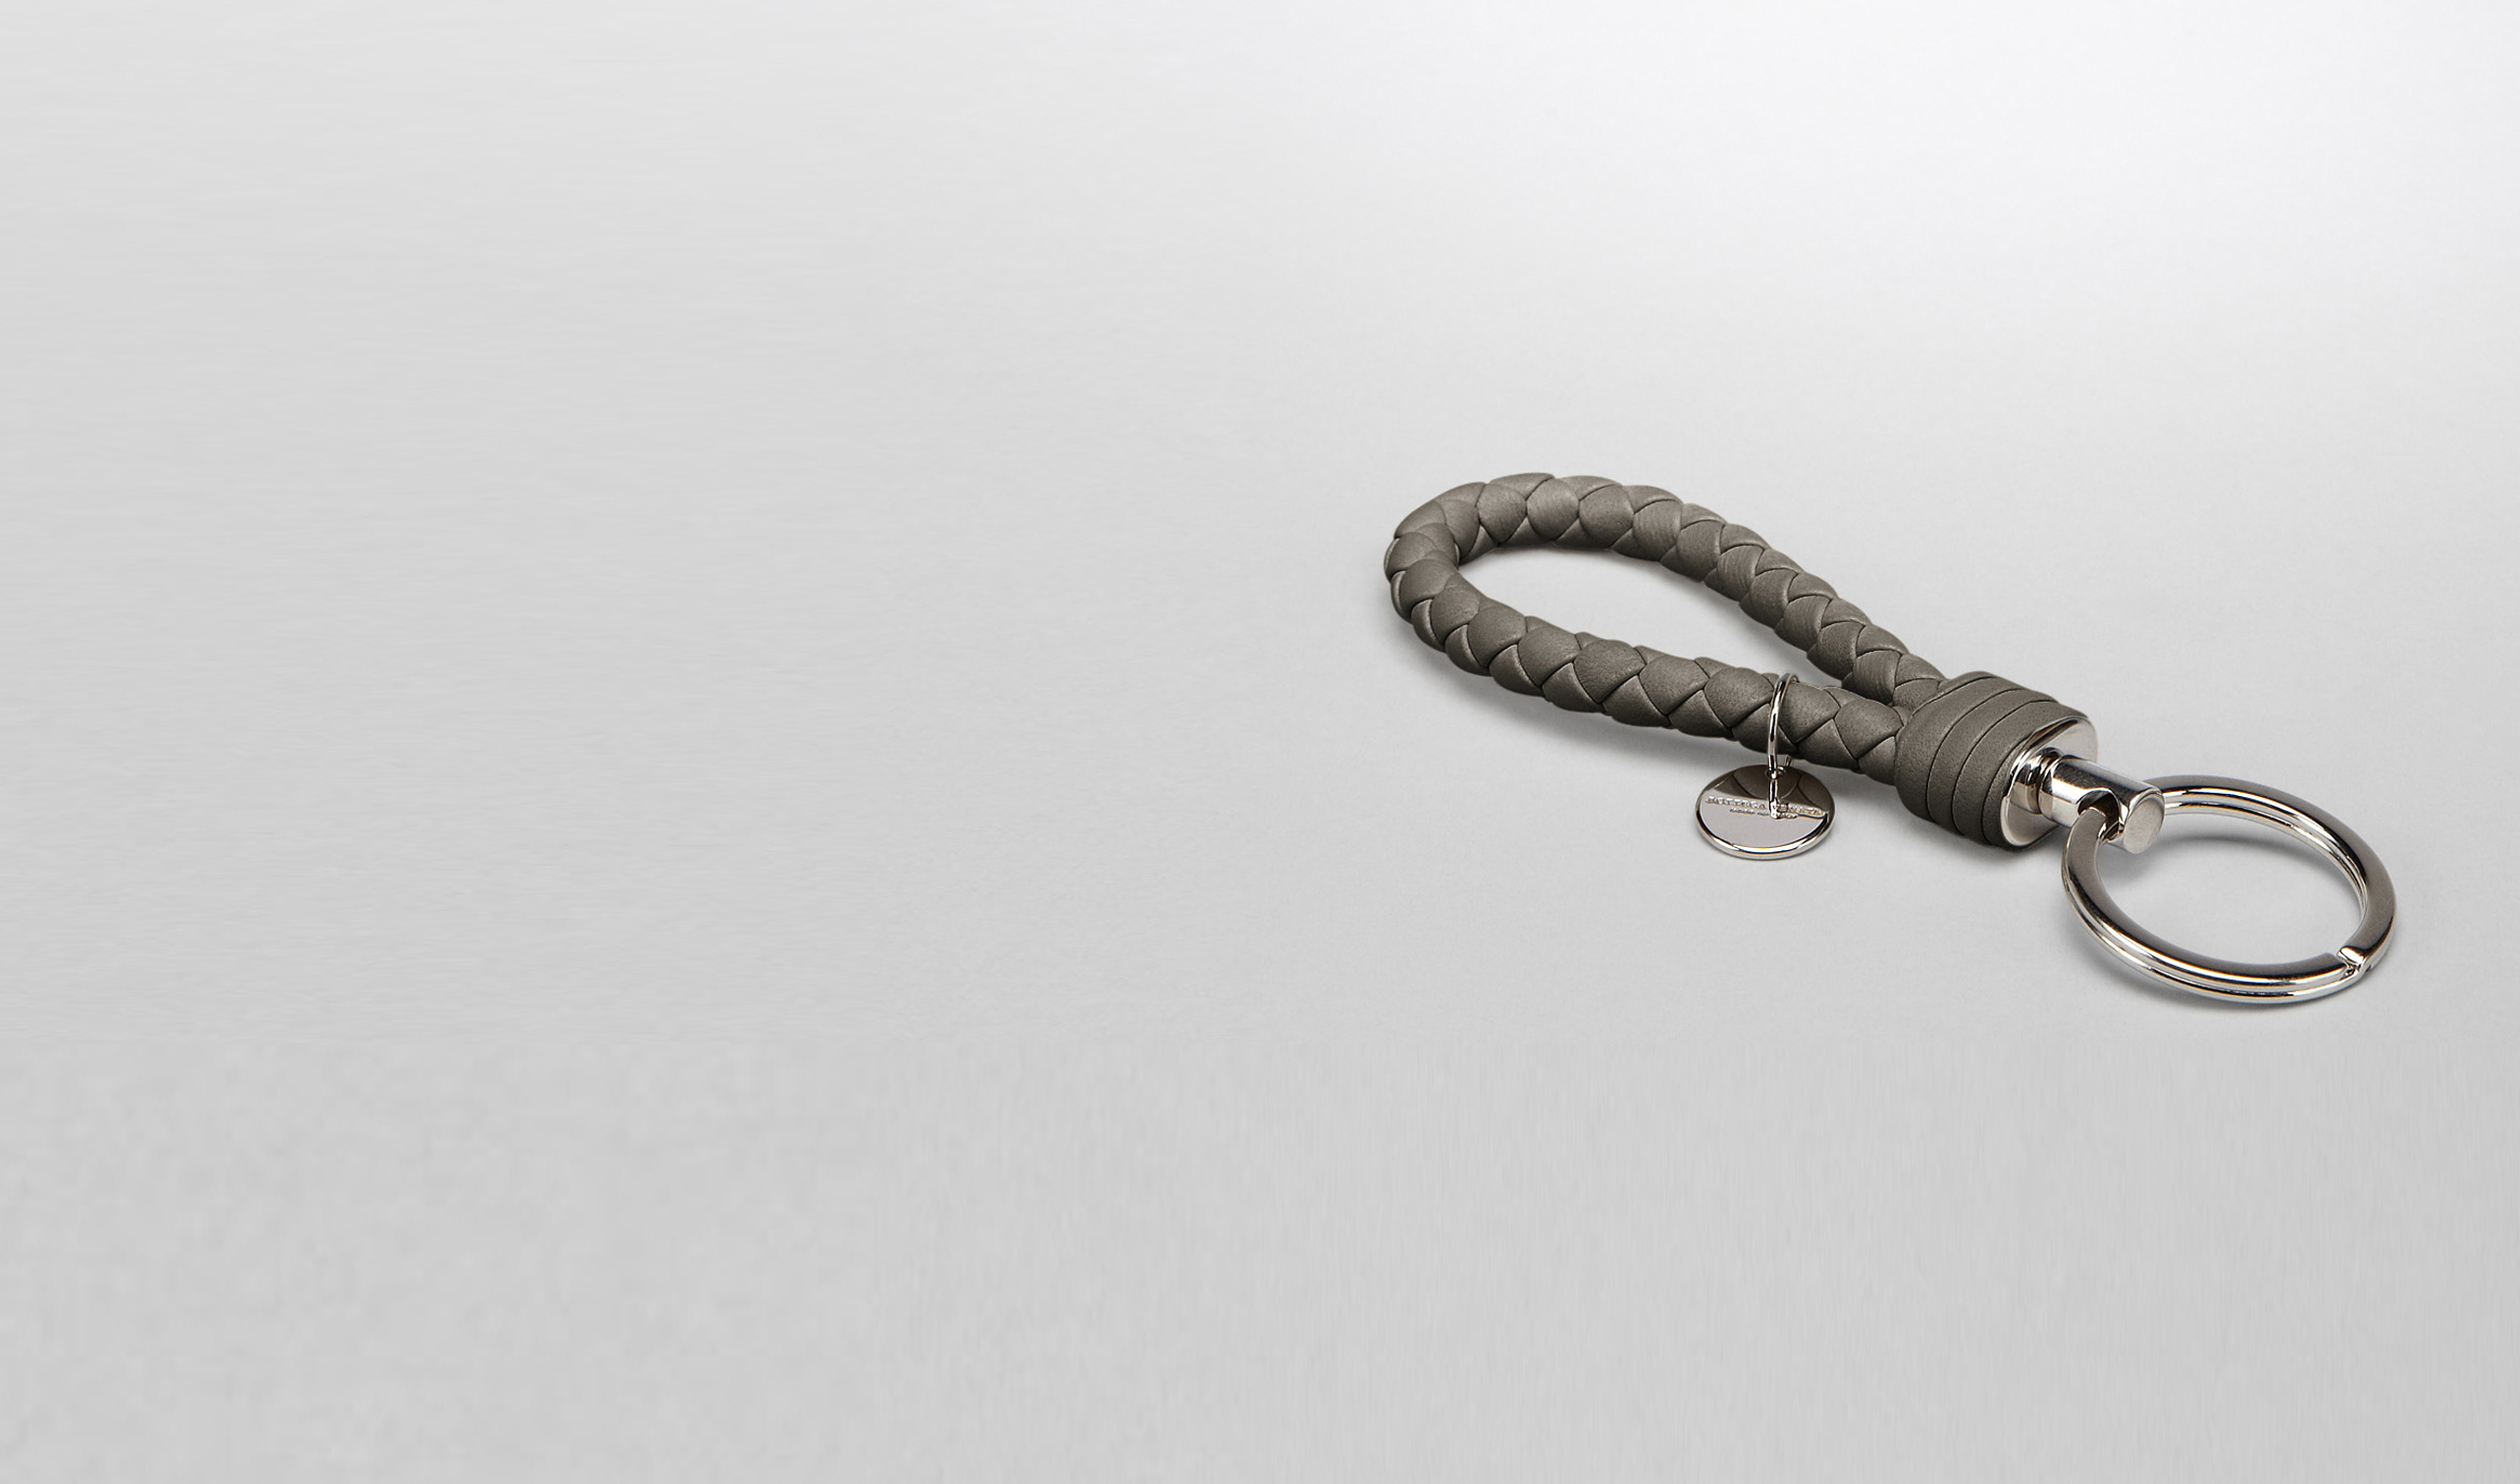 BOTTEGA VENETA Keyring or Bracelets E Ebano Intrecciato Nappa Key Ring pl